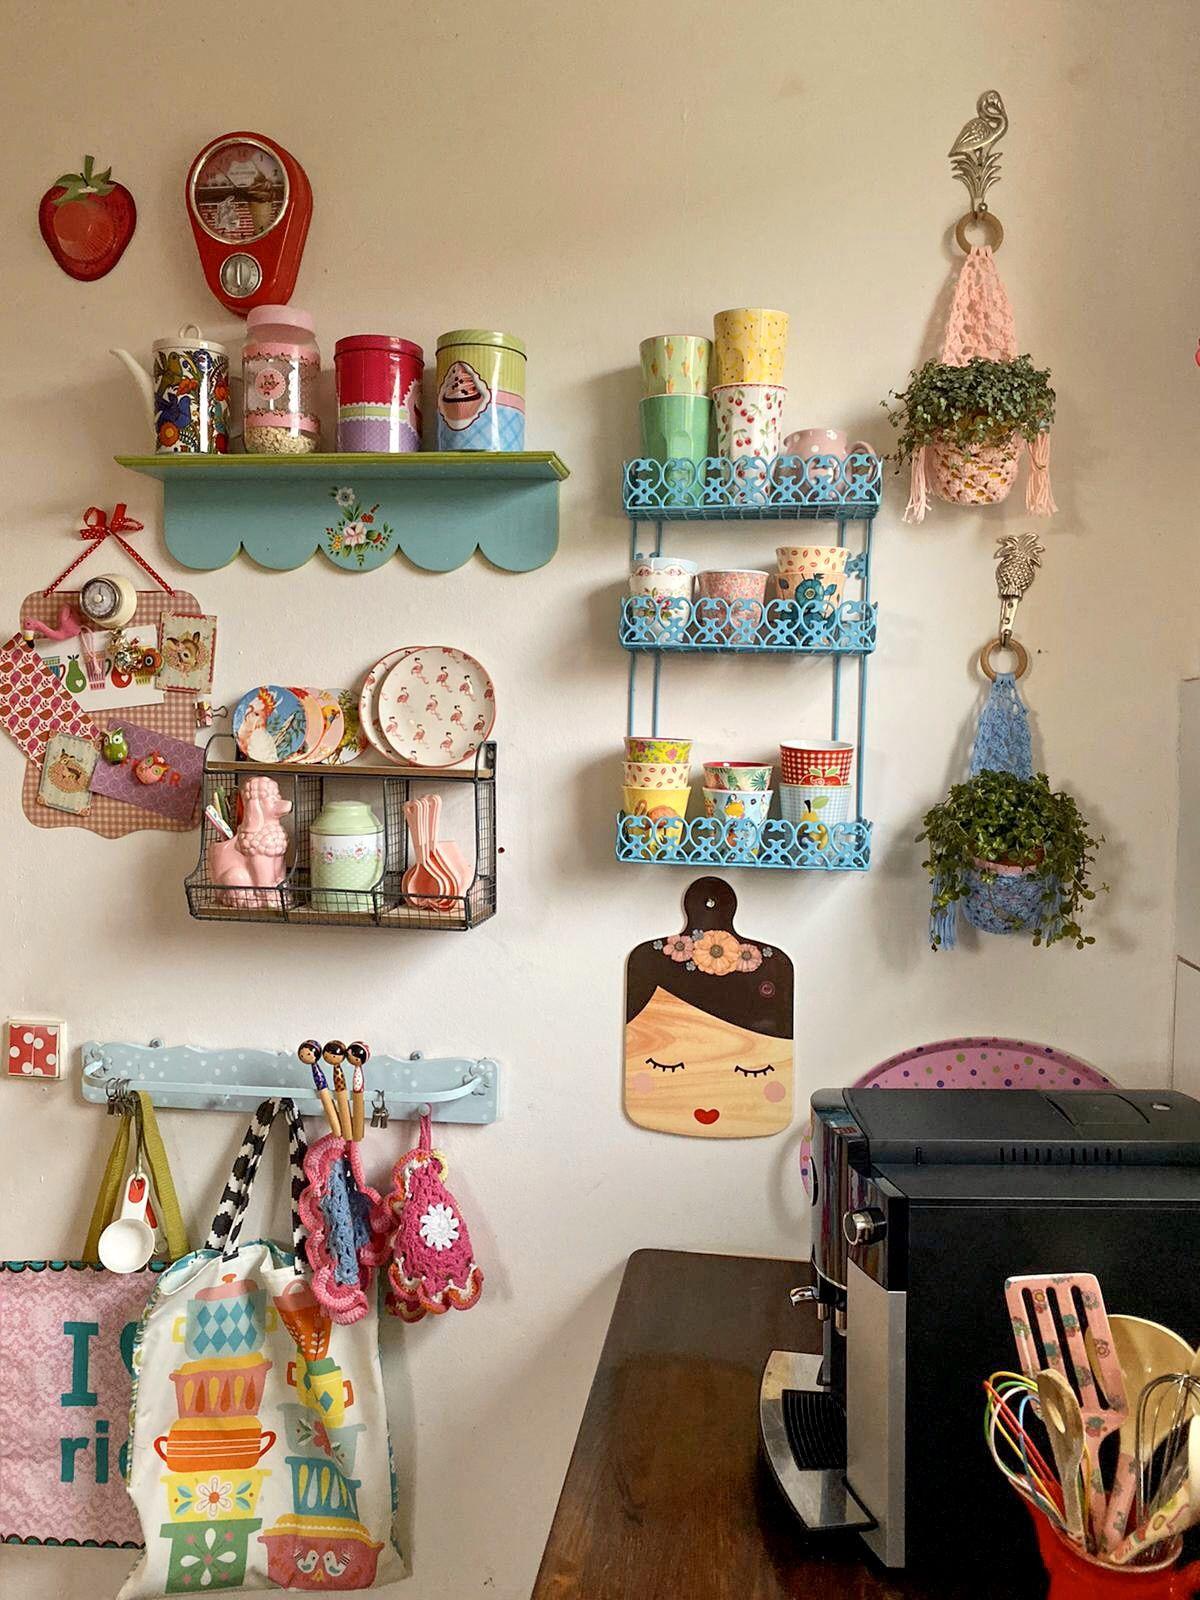 Pin Von Arlette Rush Auf Kitchens Of The Home Bunte Kuche Kuche Bunt